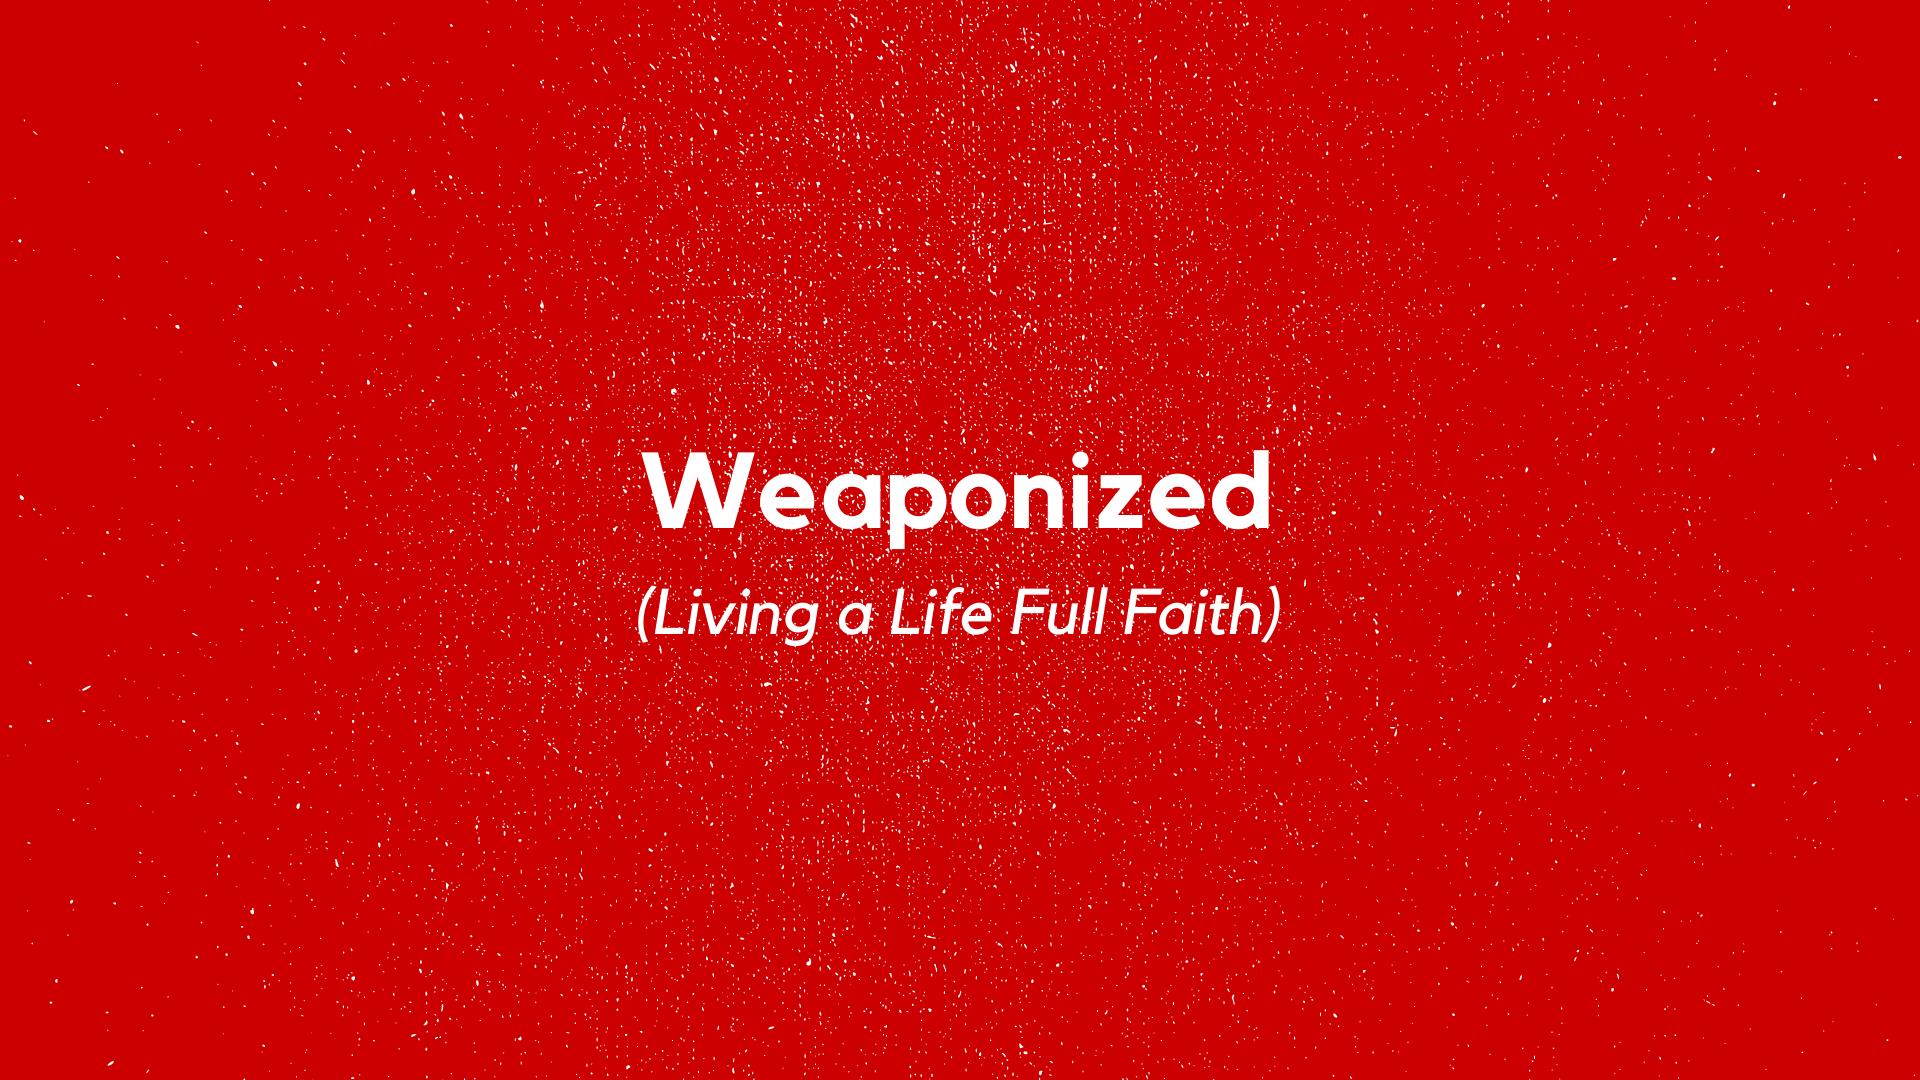 Weaponized(Living a Life Full Faith)